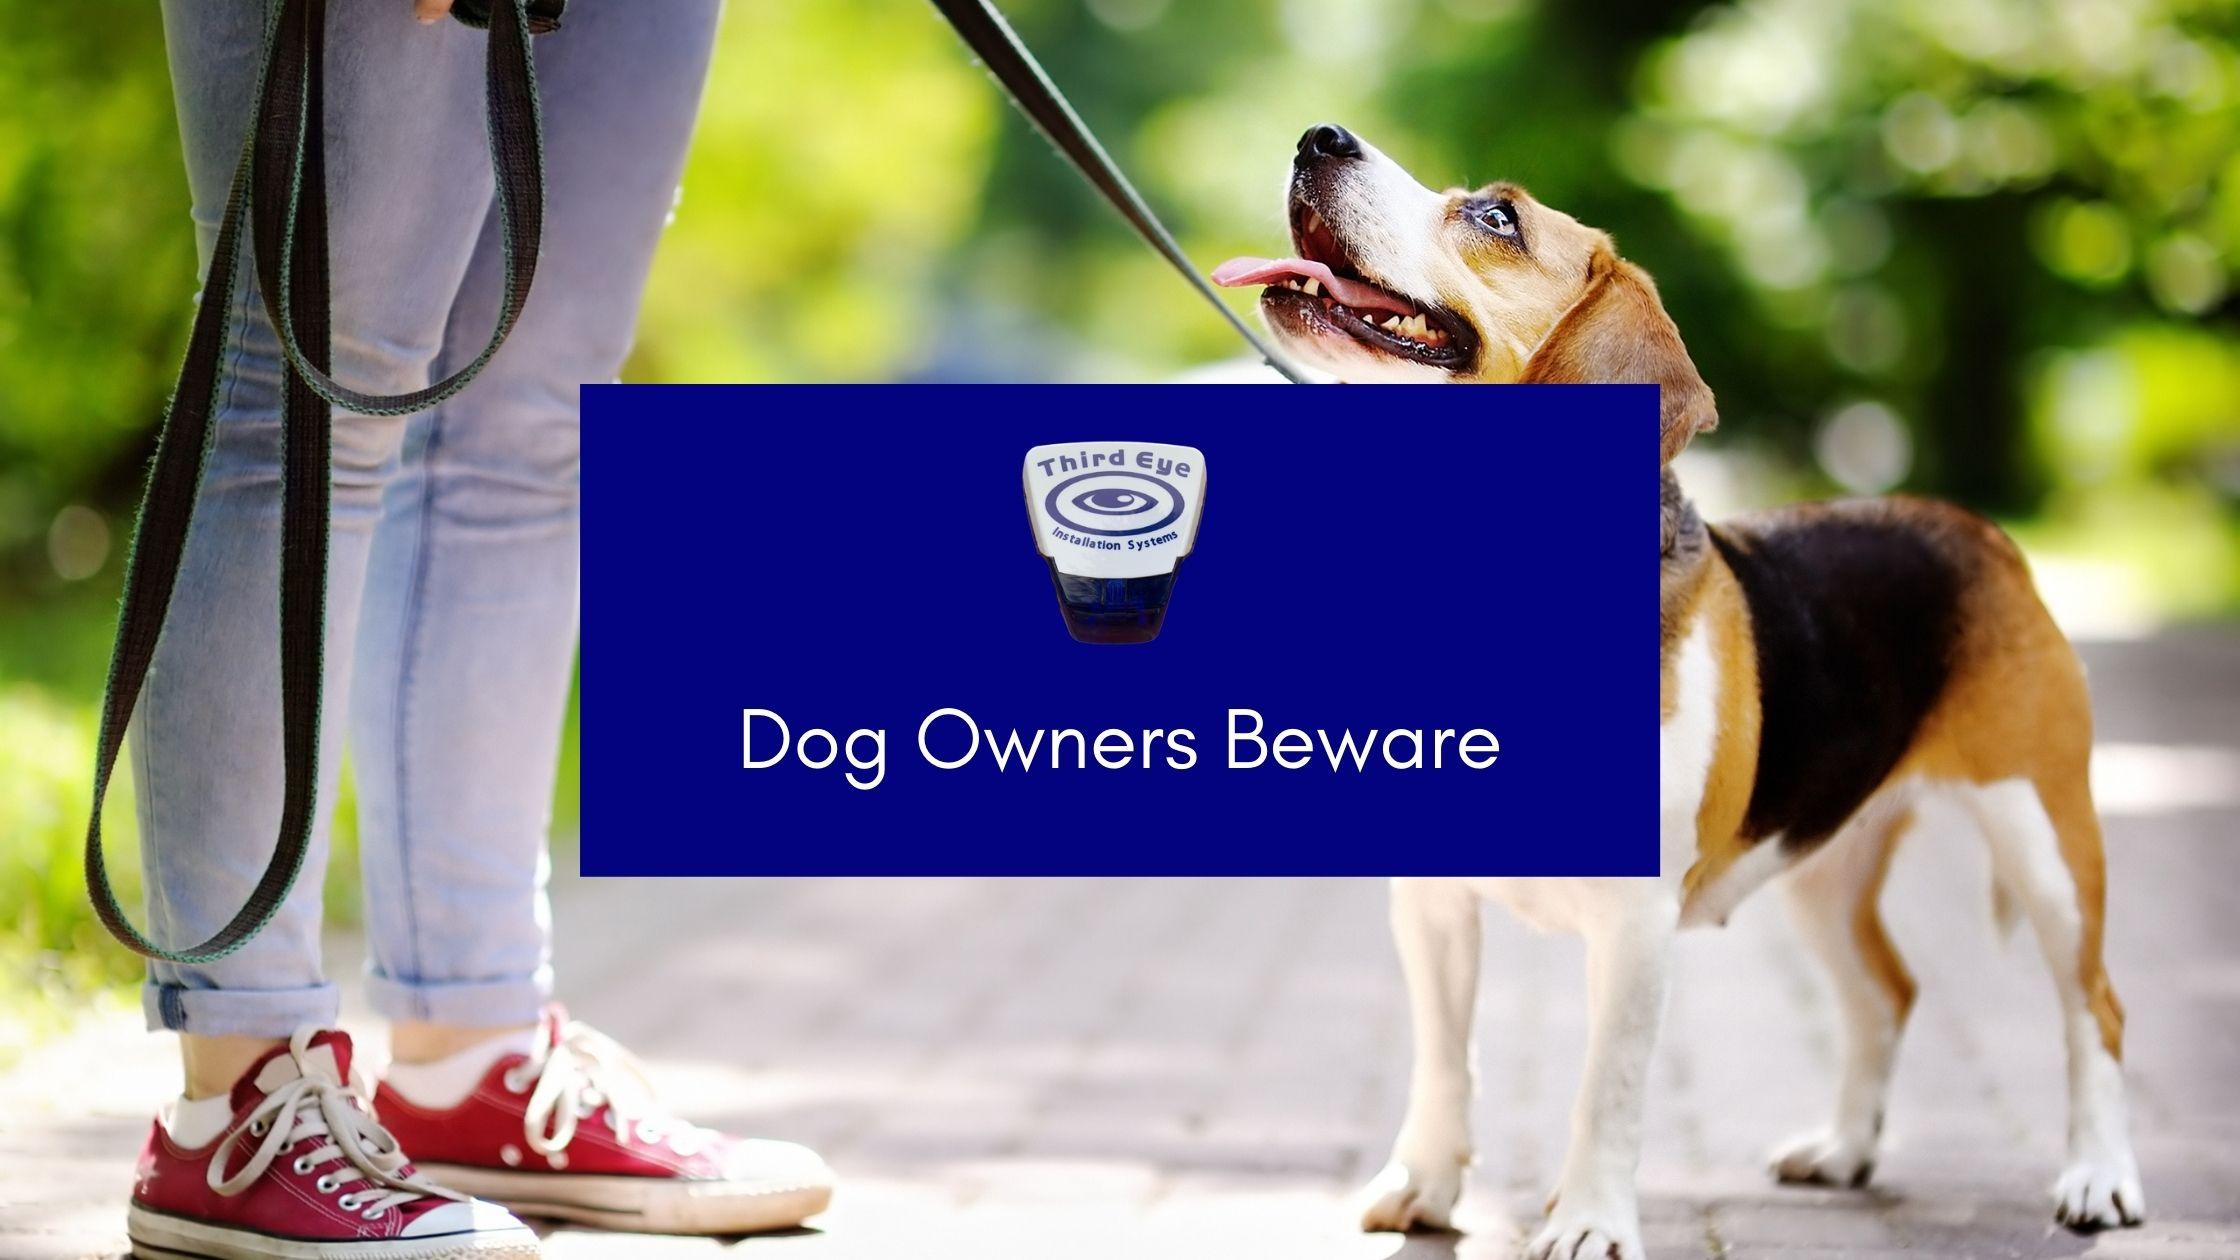 Dog Owners - beware